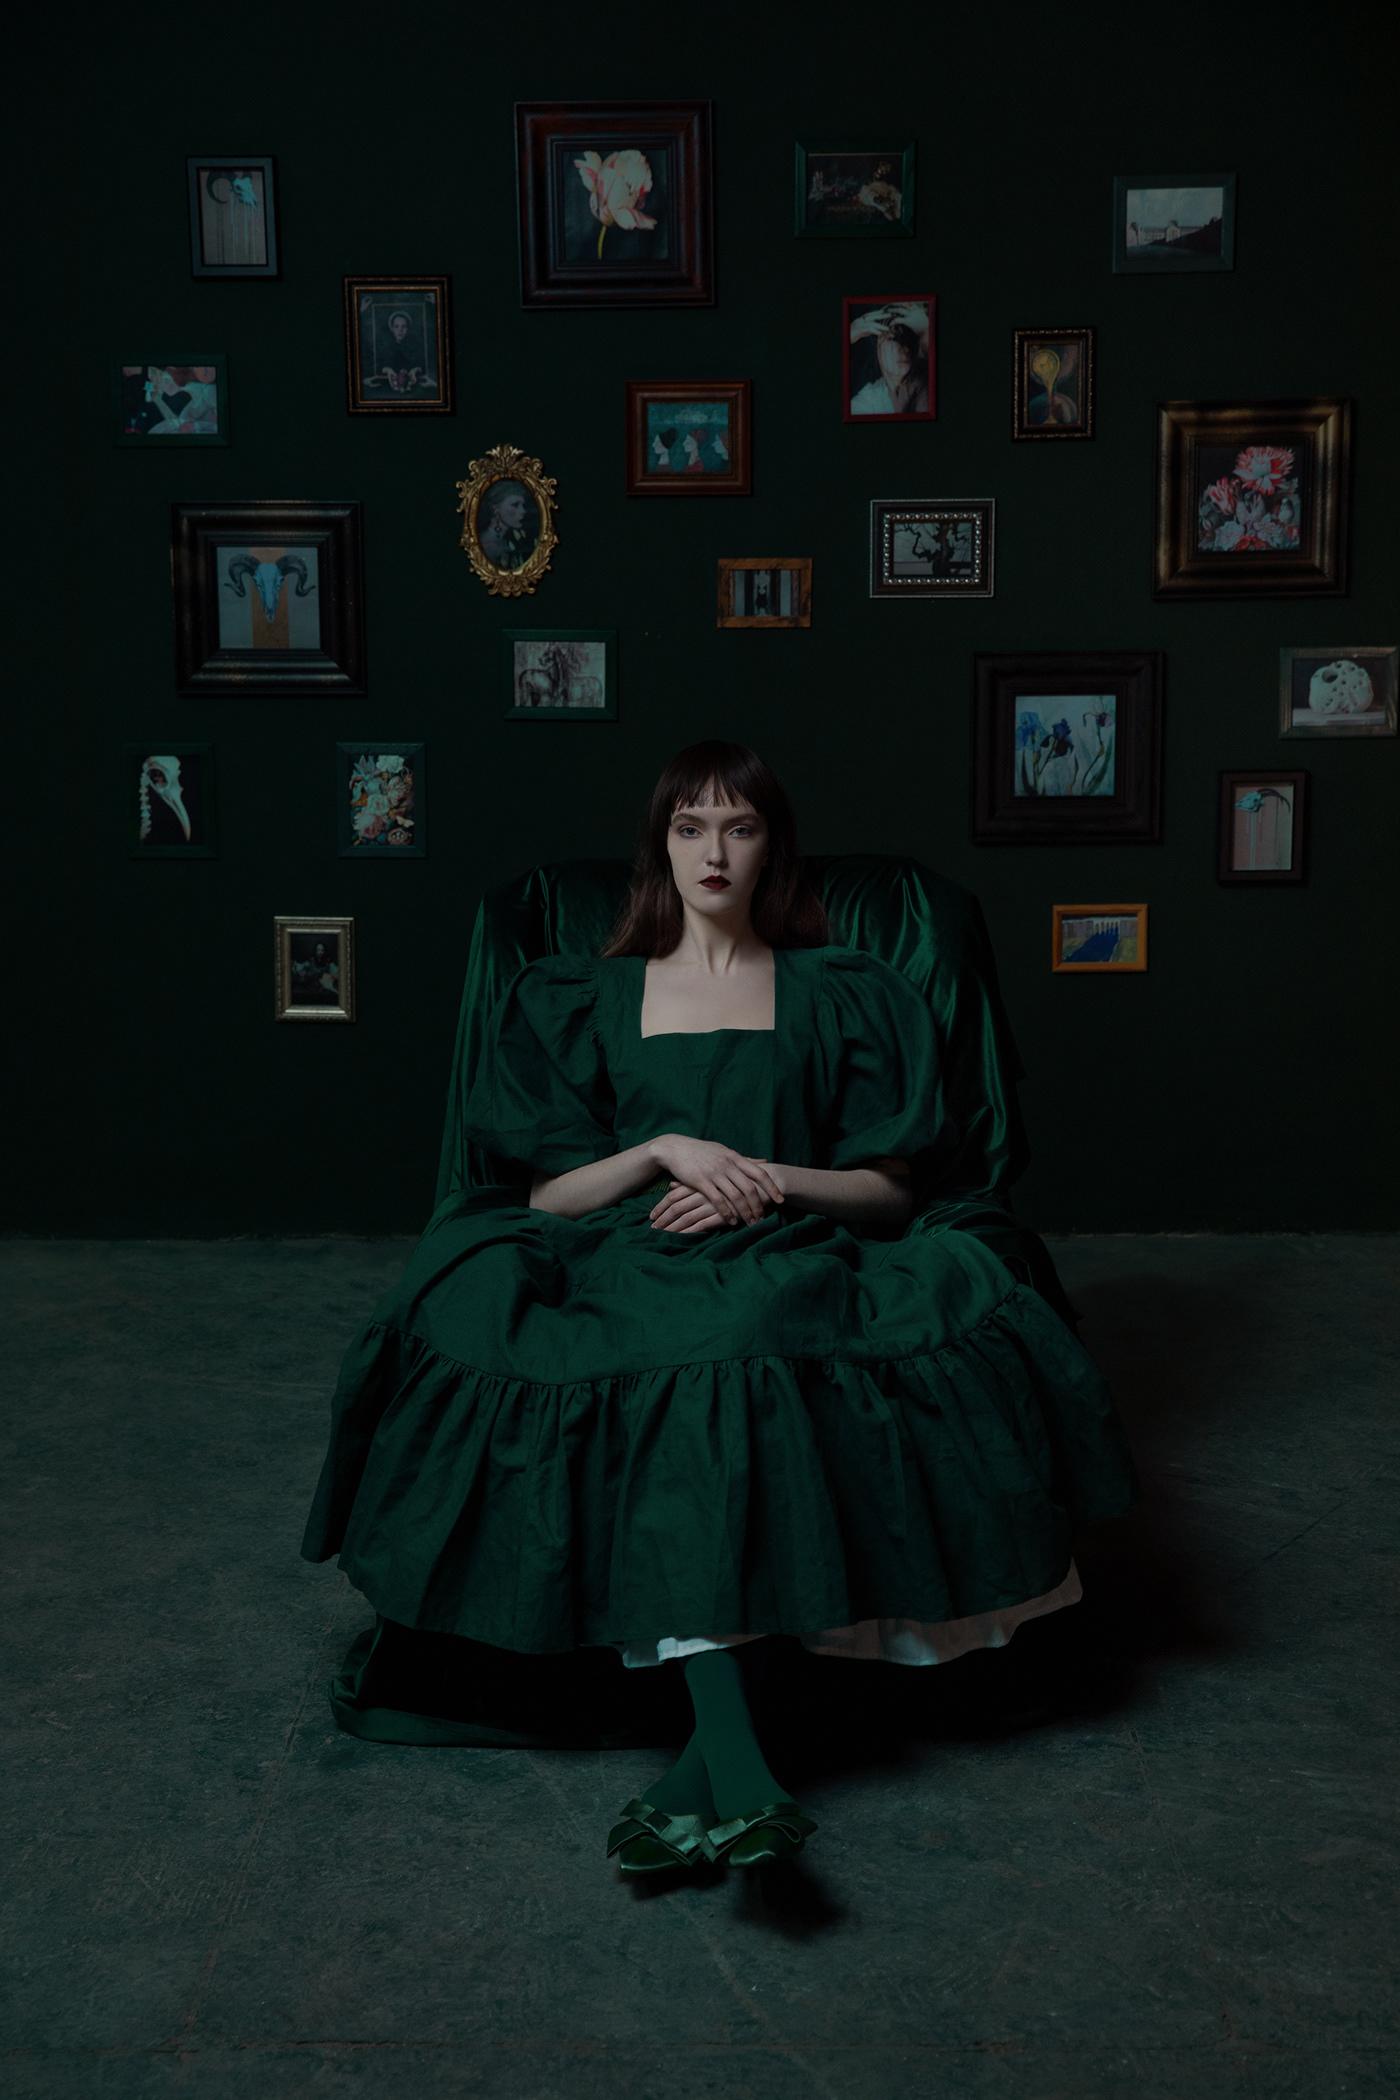 art,beauty,fairy tale,frame,frozen,narcissus,rebirtth,room,skin,Victorian